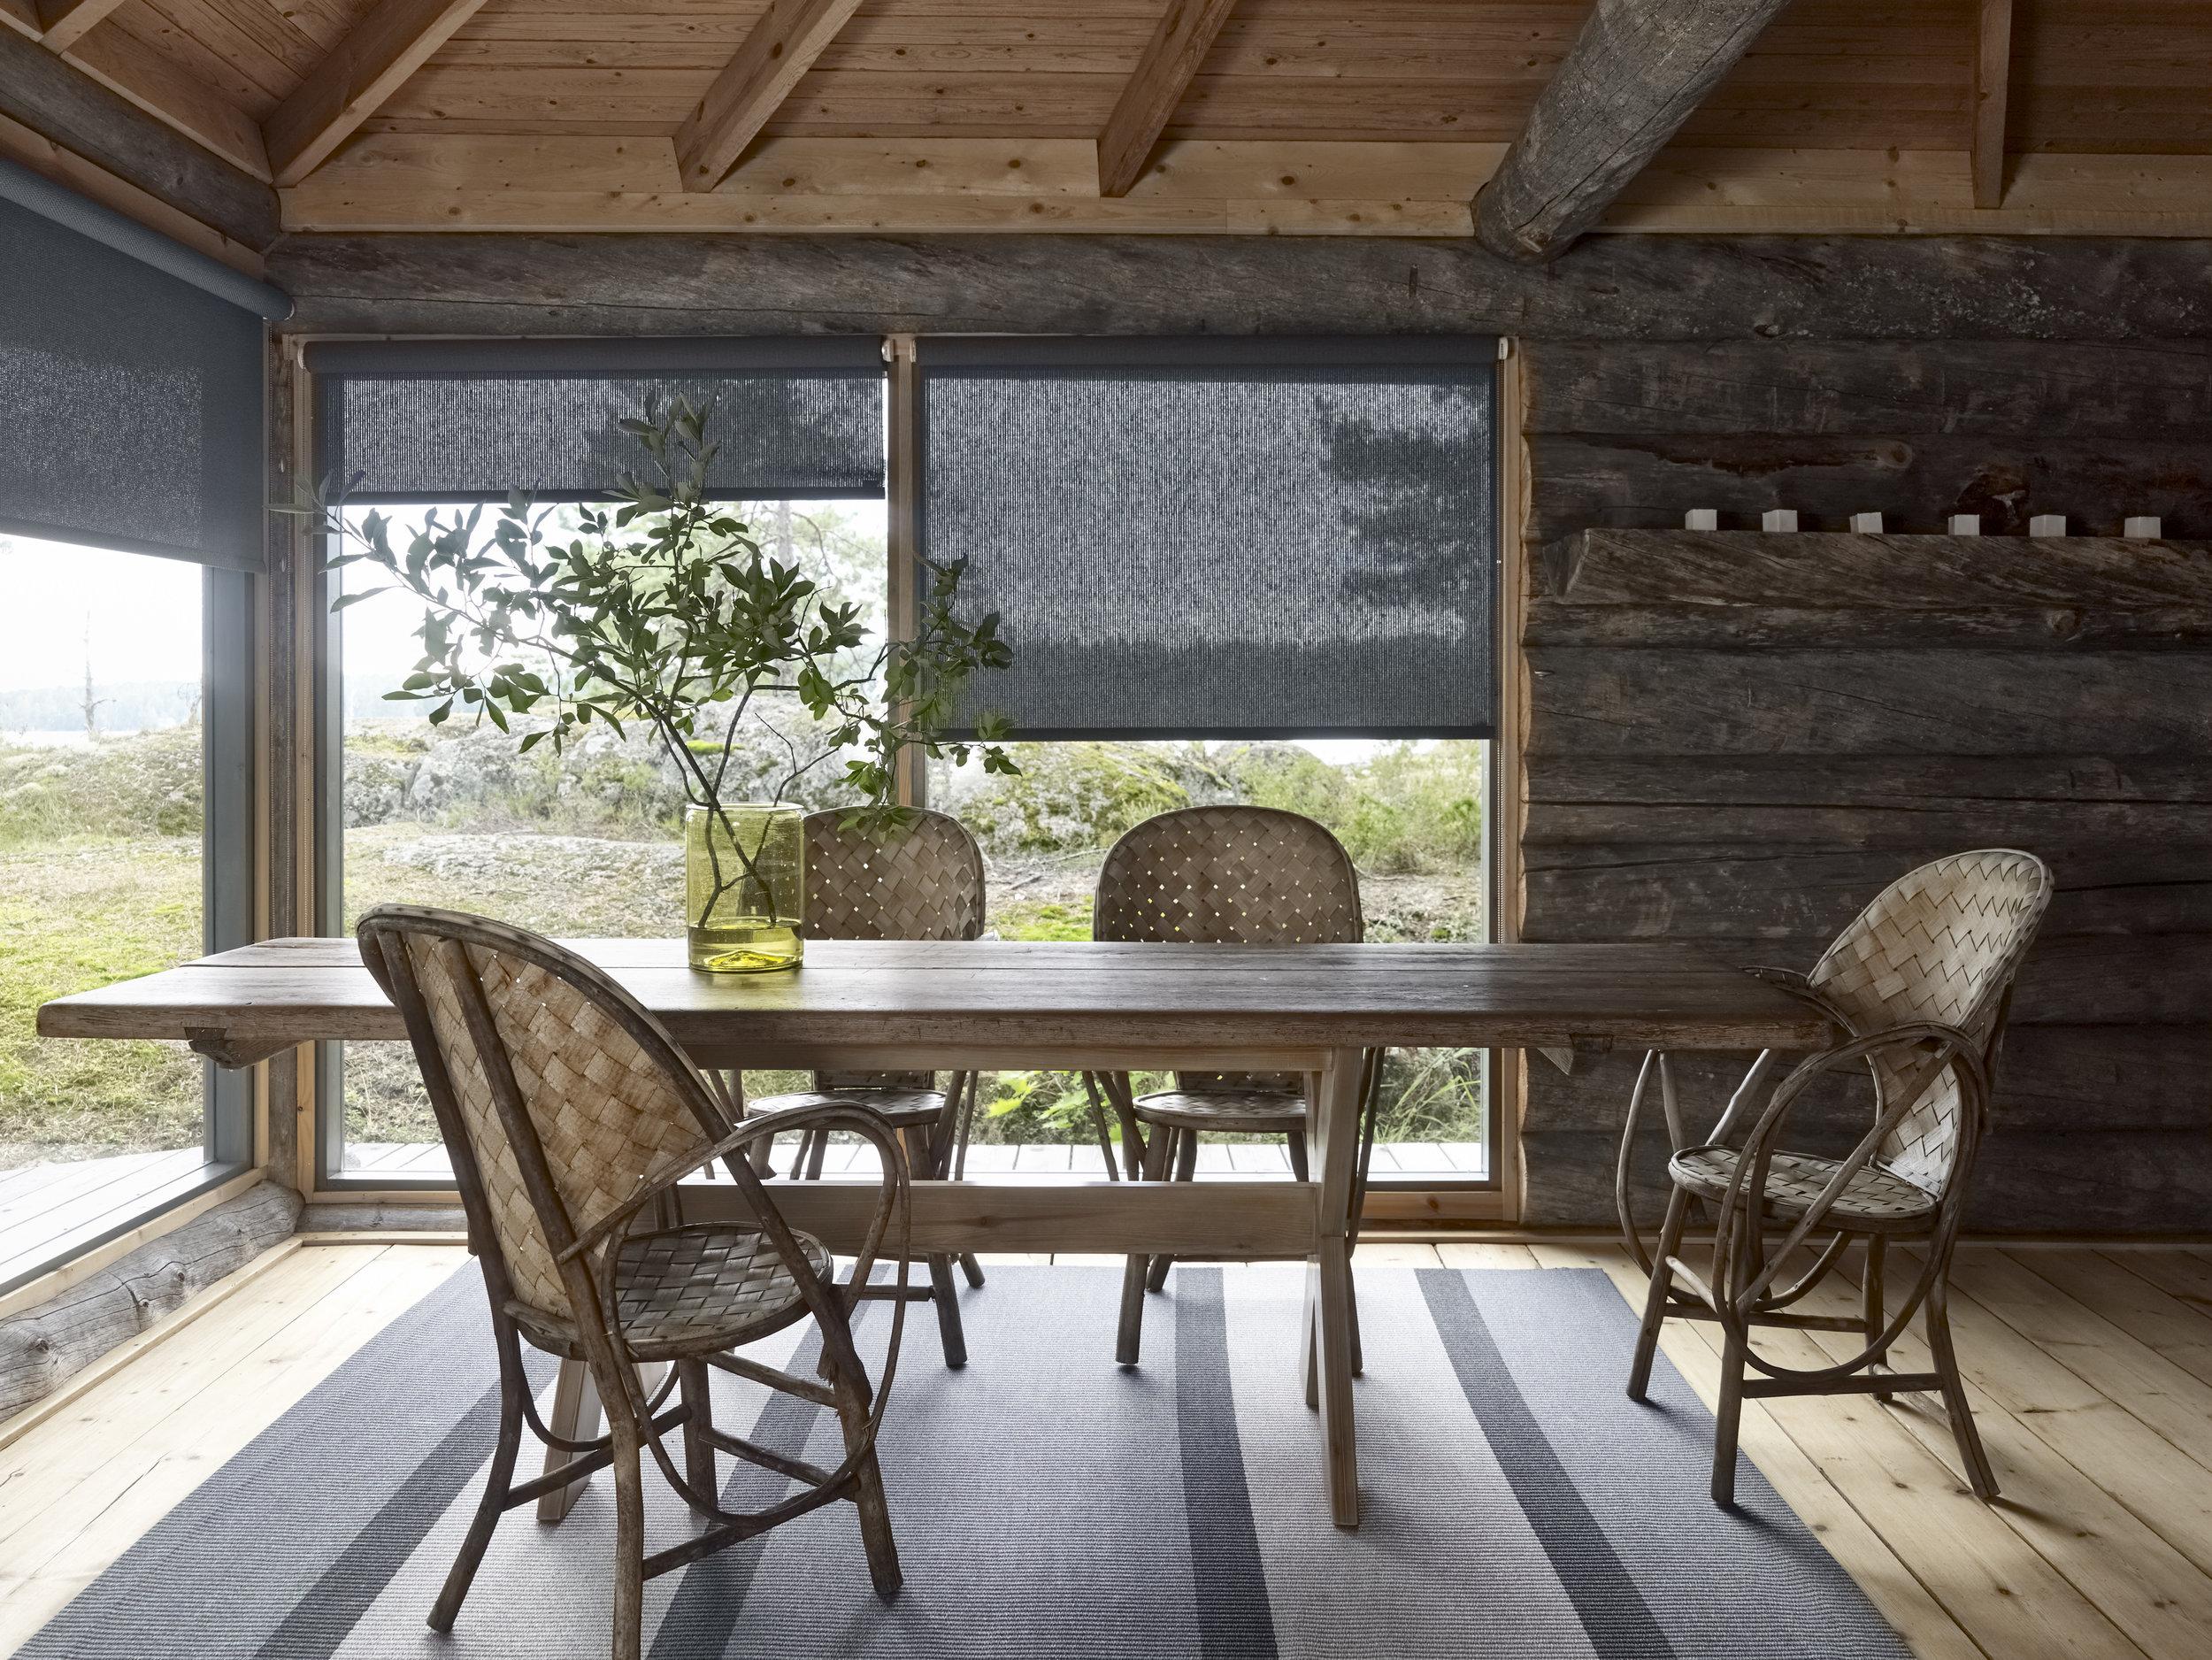 1360215  Bridge  grey-stone paper yarn carpet,  Morning  2114040 graphite roller blinds